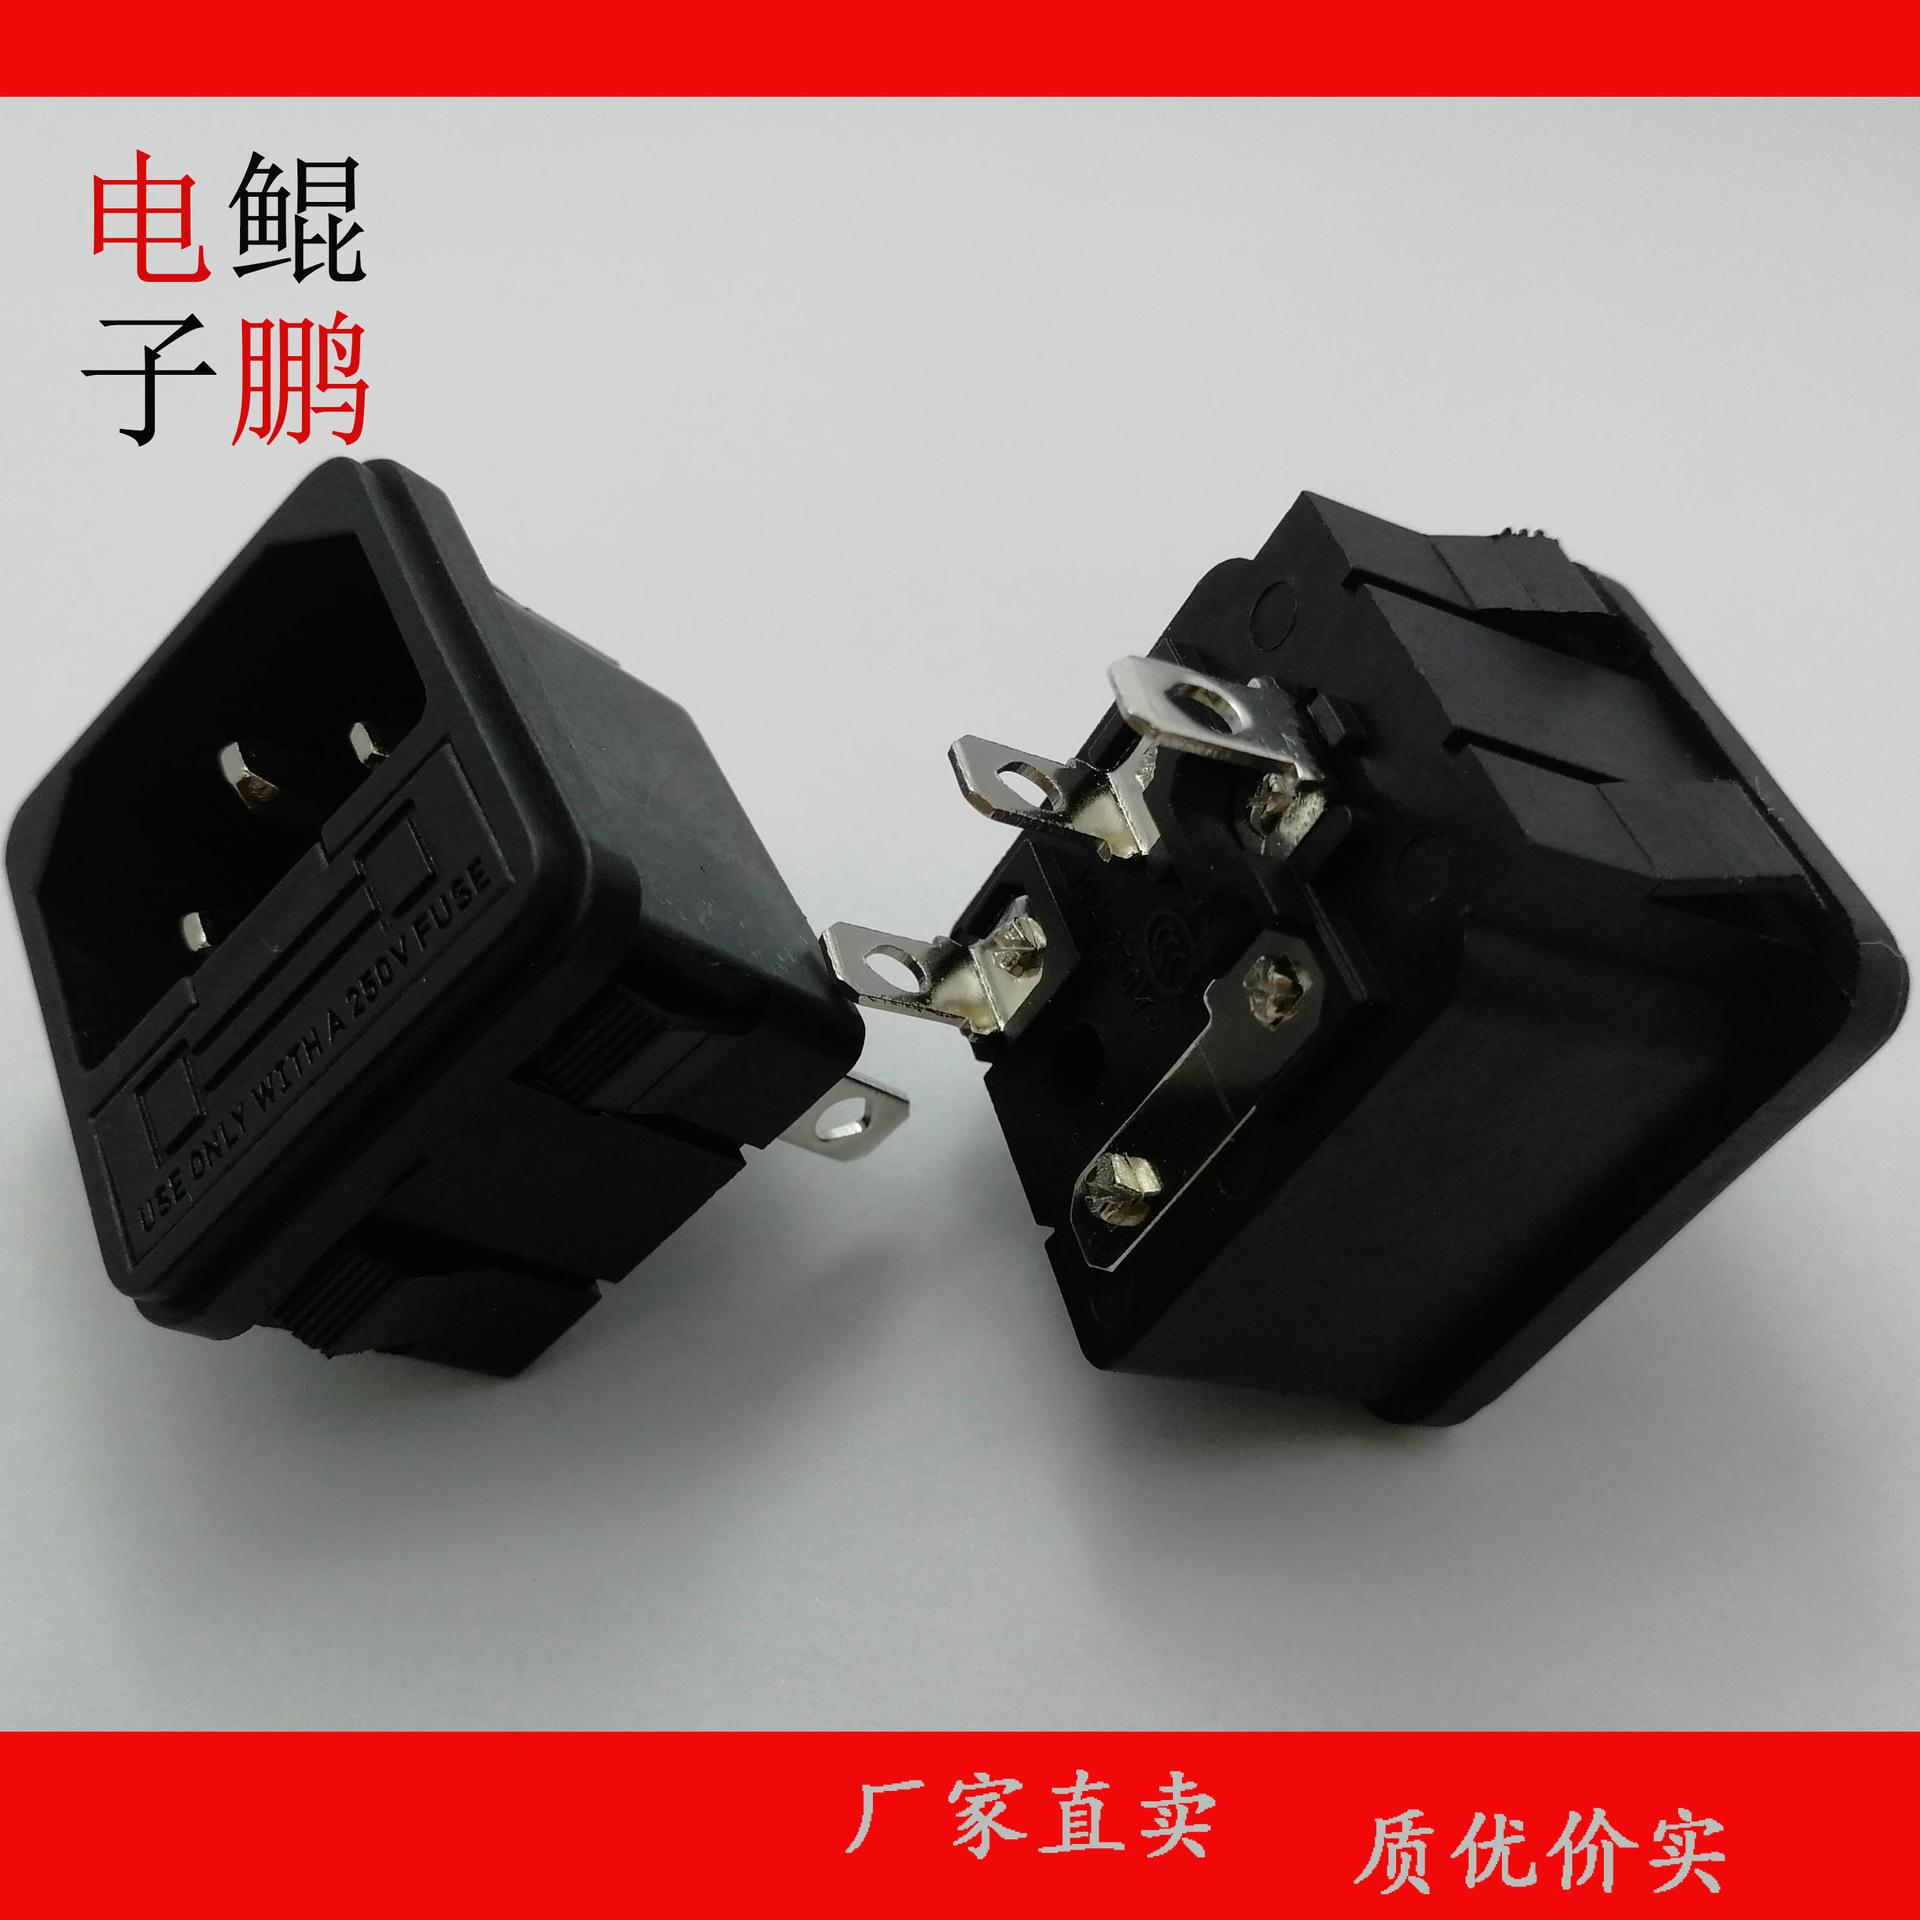 AC电源插座带保险无耳二合一品字型 小家电 办公设备 打印机